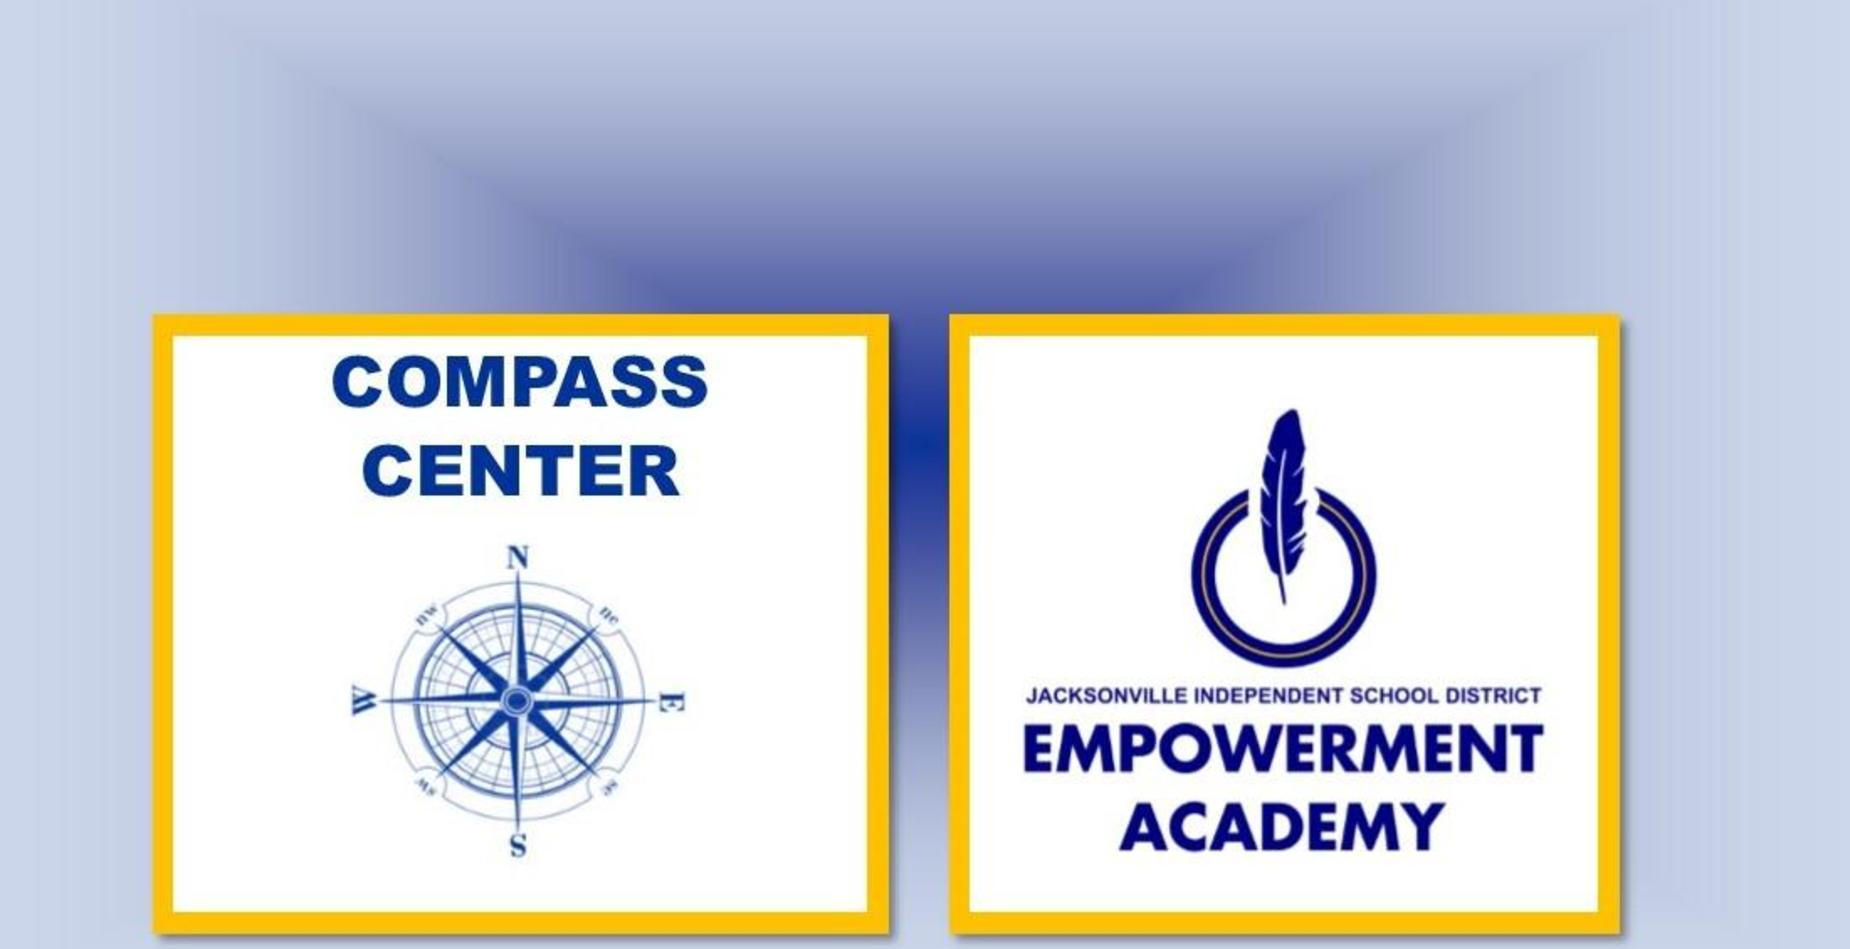 empowerment academy logo